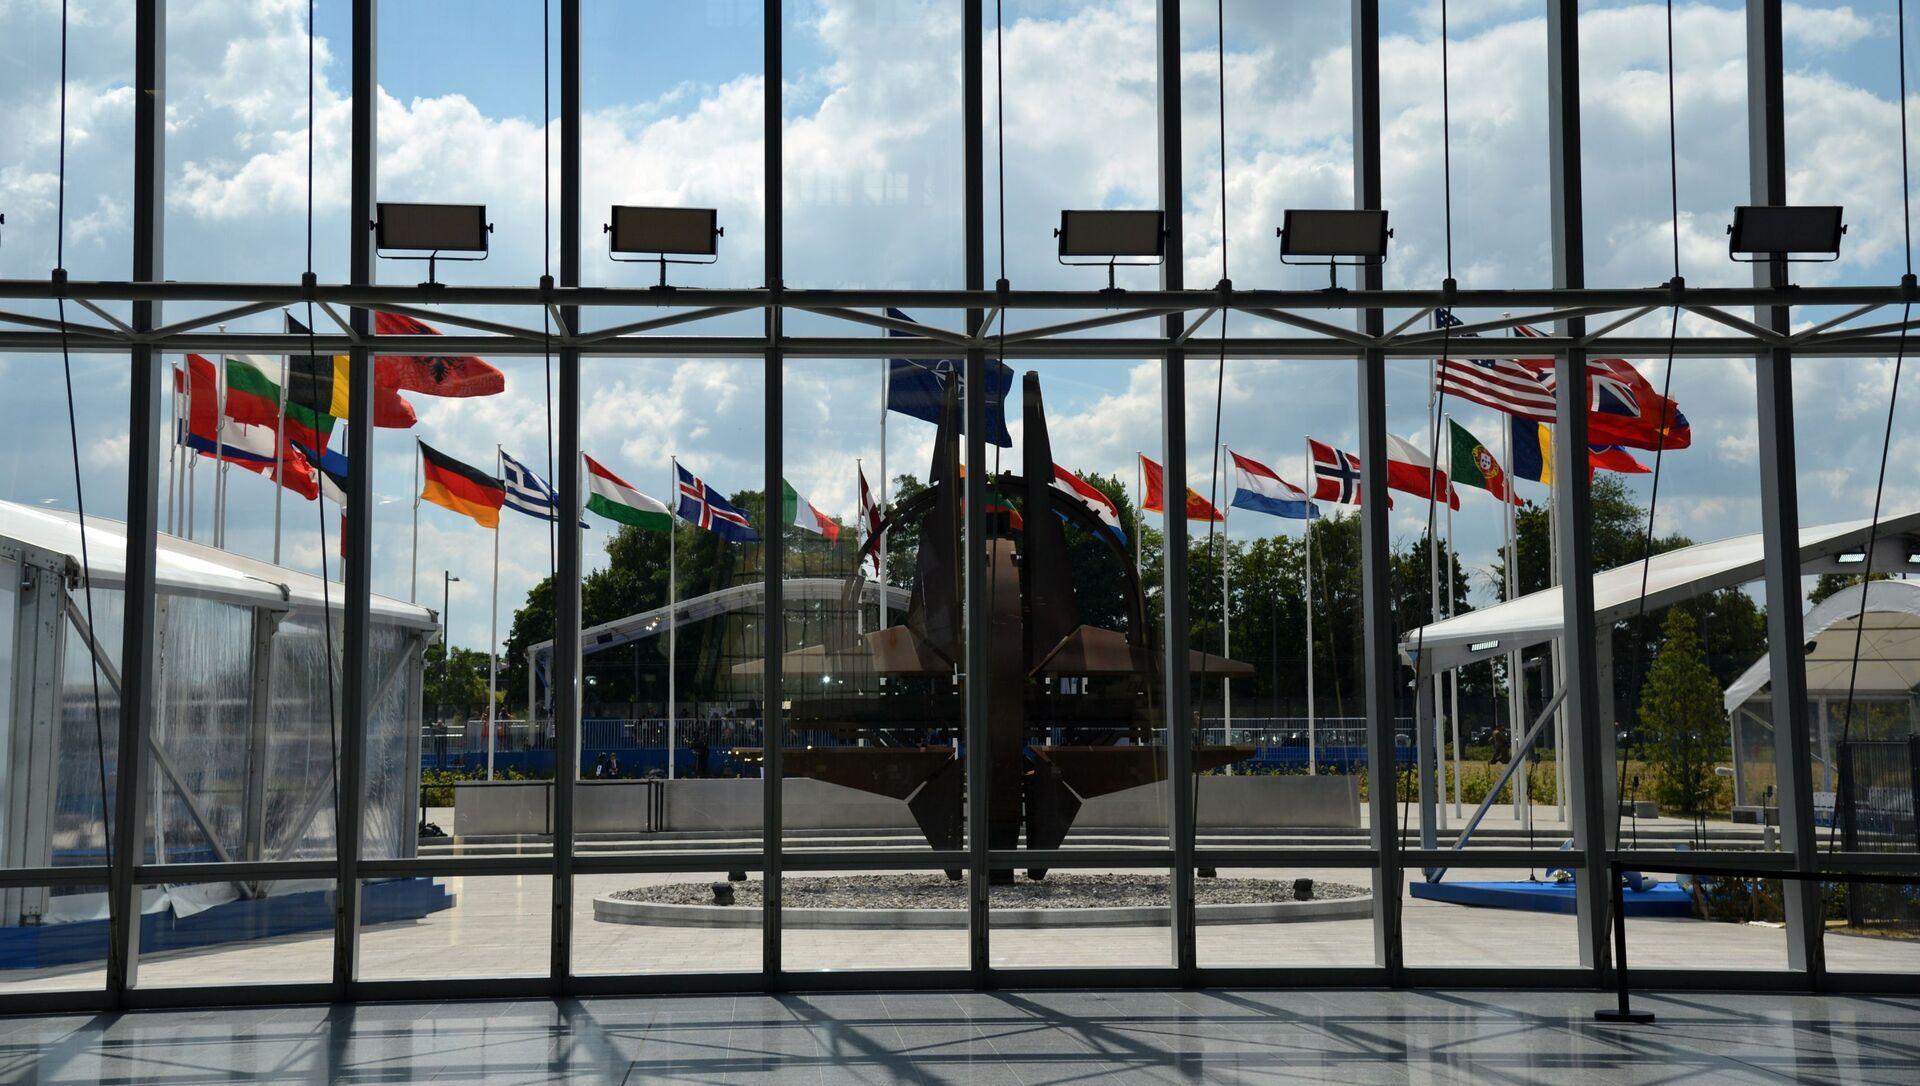 Новая штаб-квартира НАТО в Брюсселе - Sputnik Азербайджан, 1920, 01.06.2021